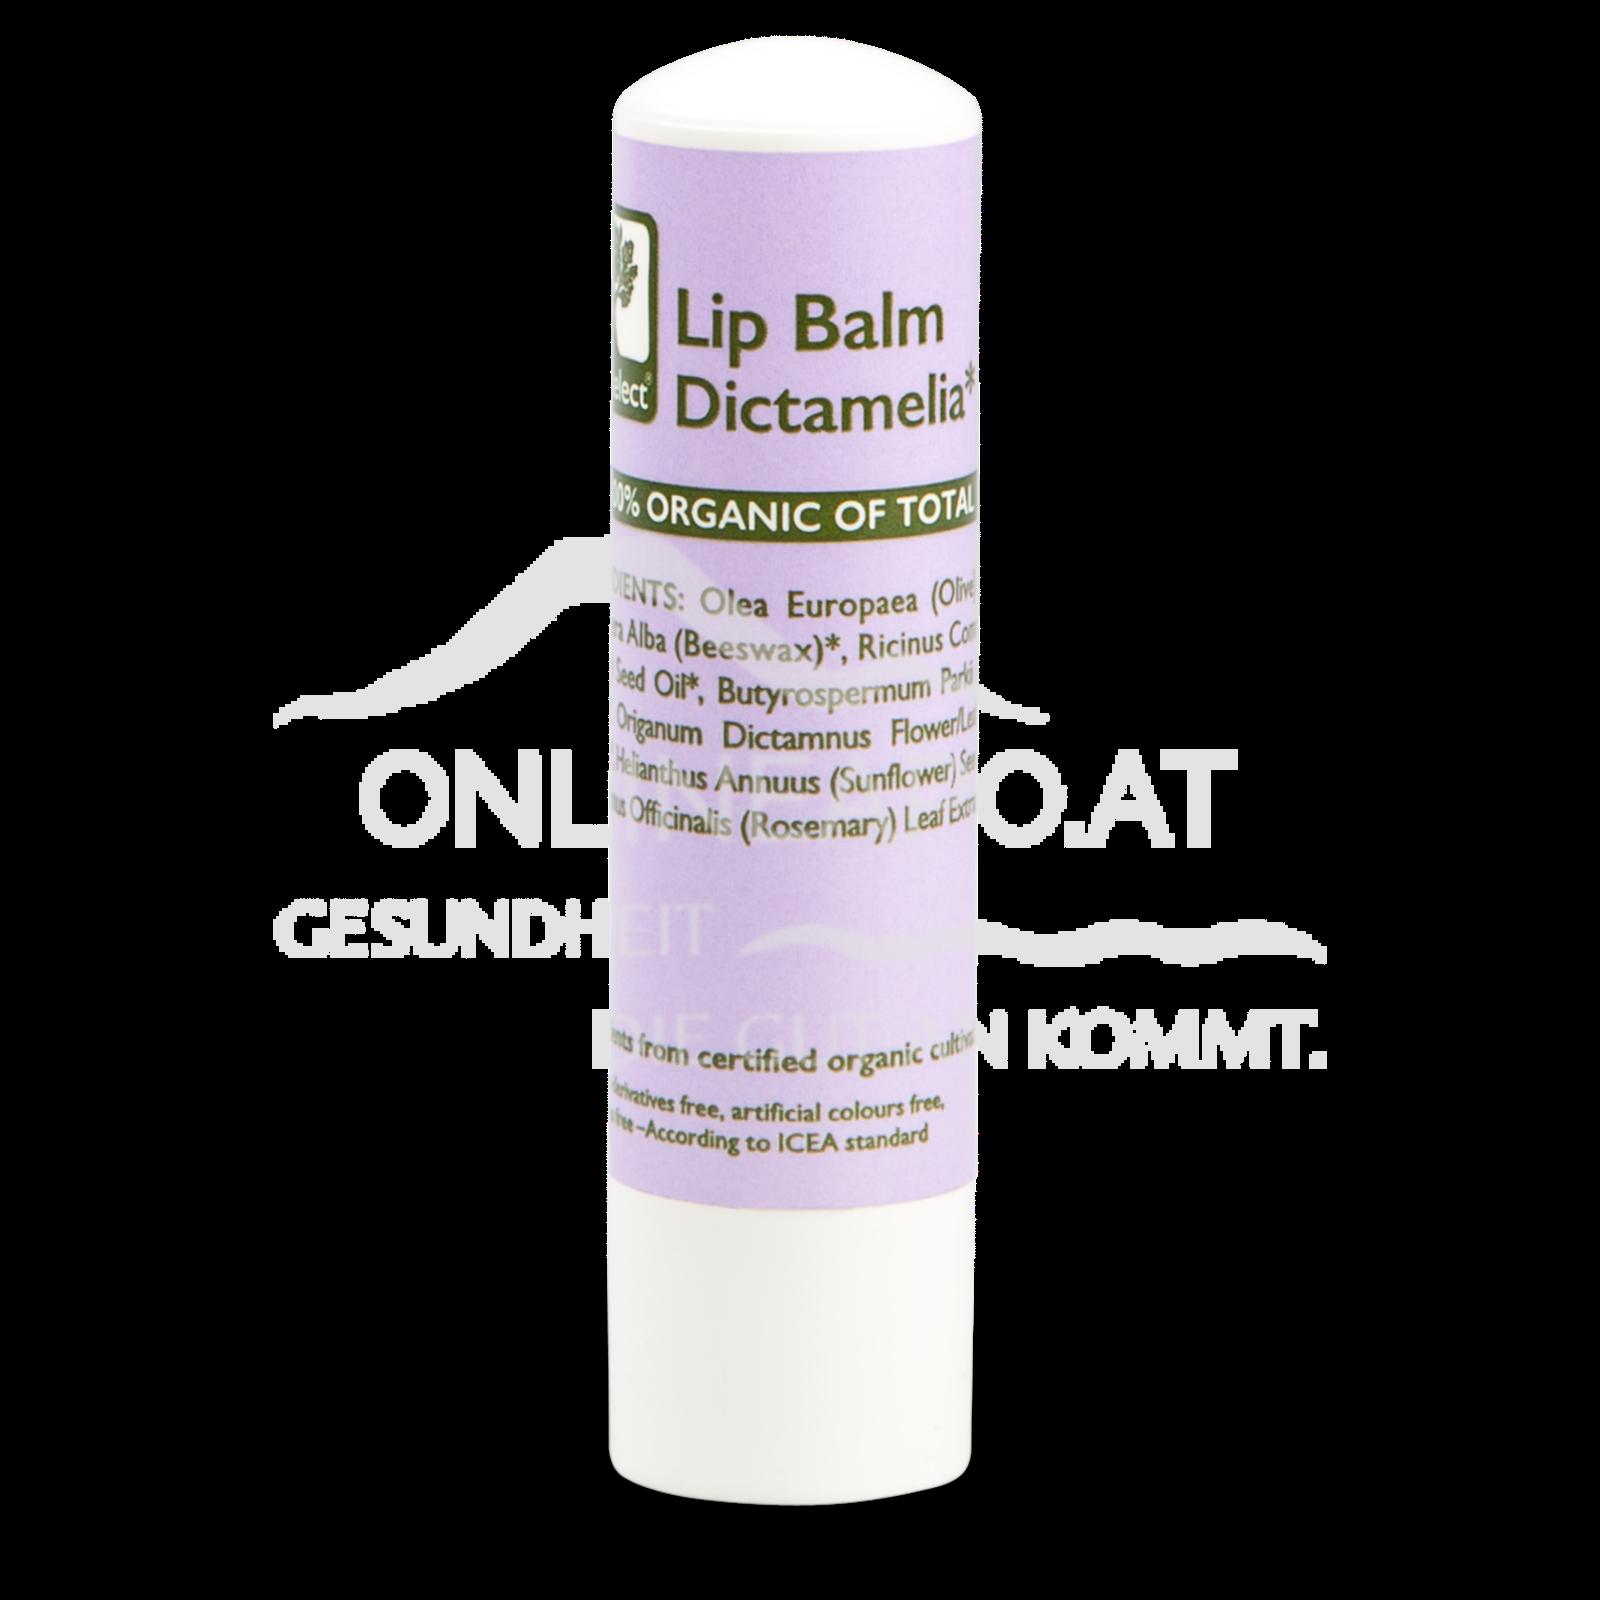 Bioselect Lip Balm Dictamelia®